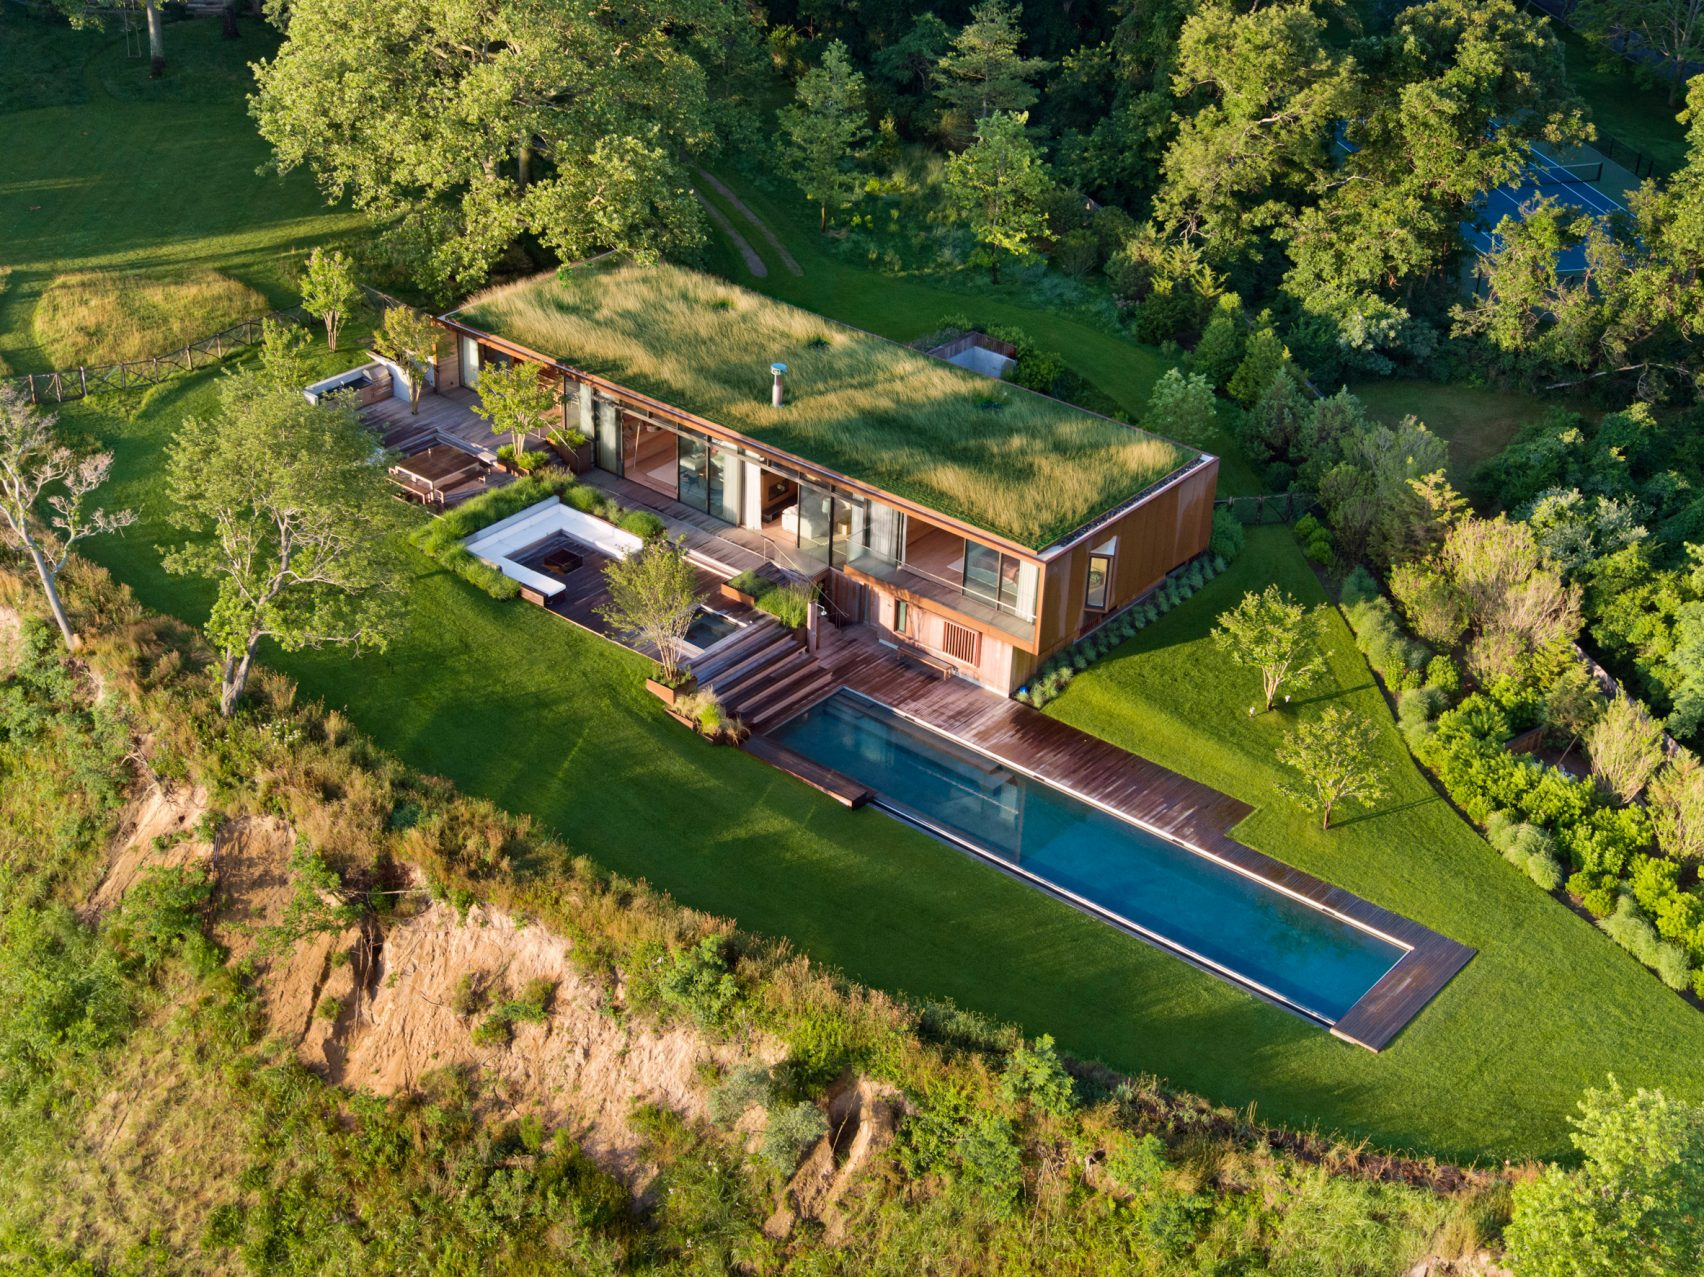 peconic-house-mapos-studio-hamptons-long-island-new-york_dezeen_2364_col_2-1704x1277.jpg